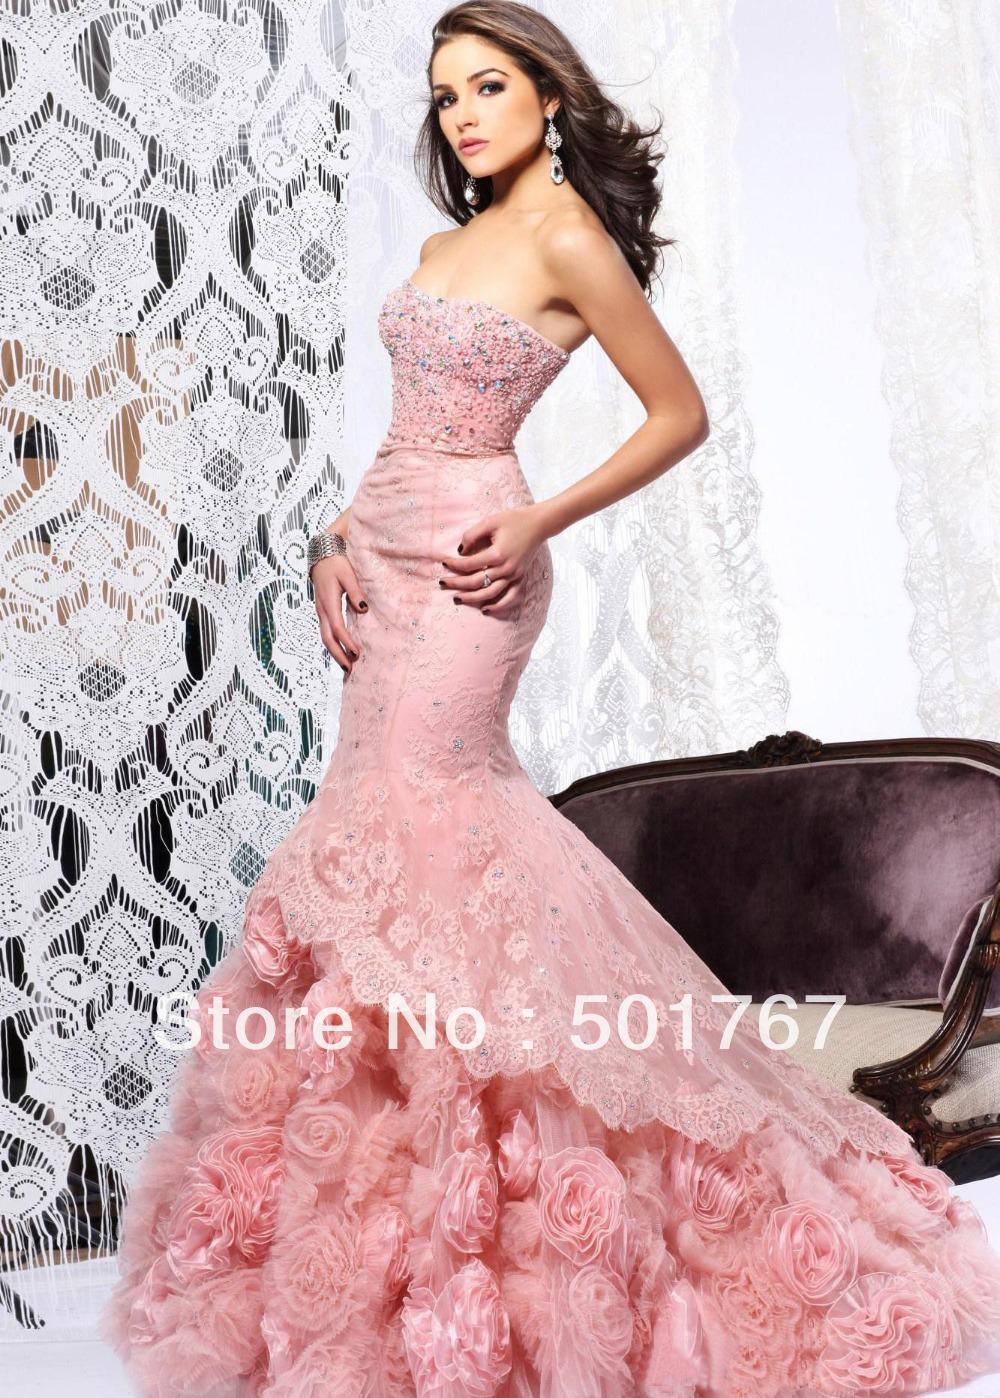 White Rose Wedding Dresses Lace 73